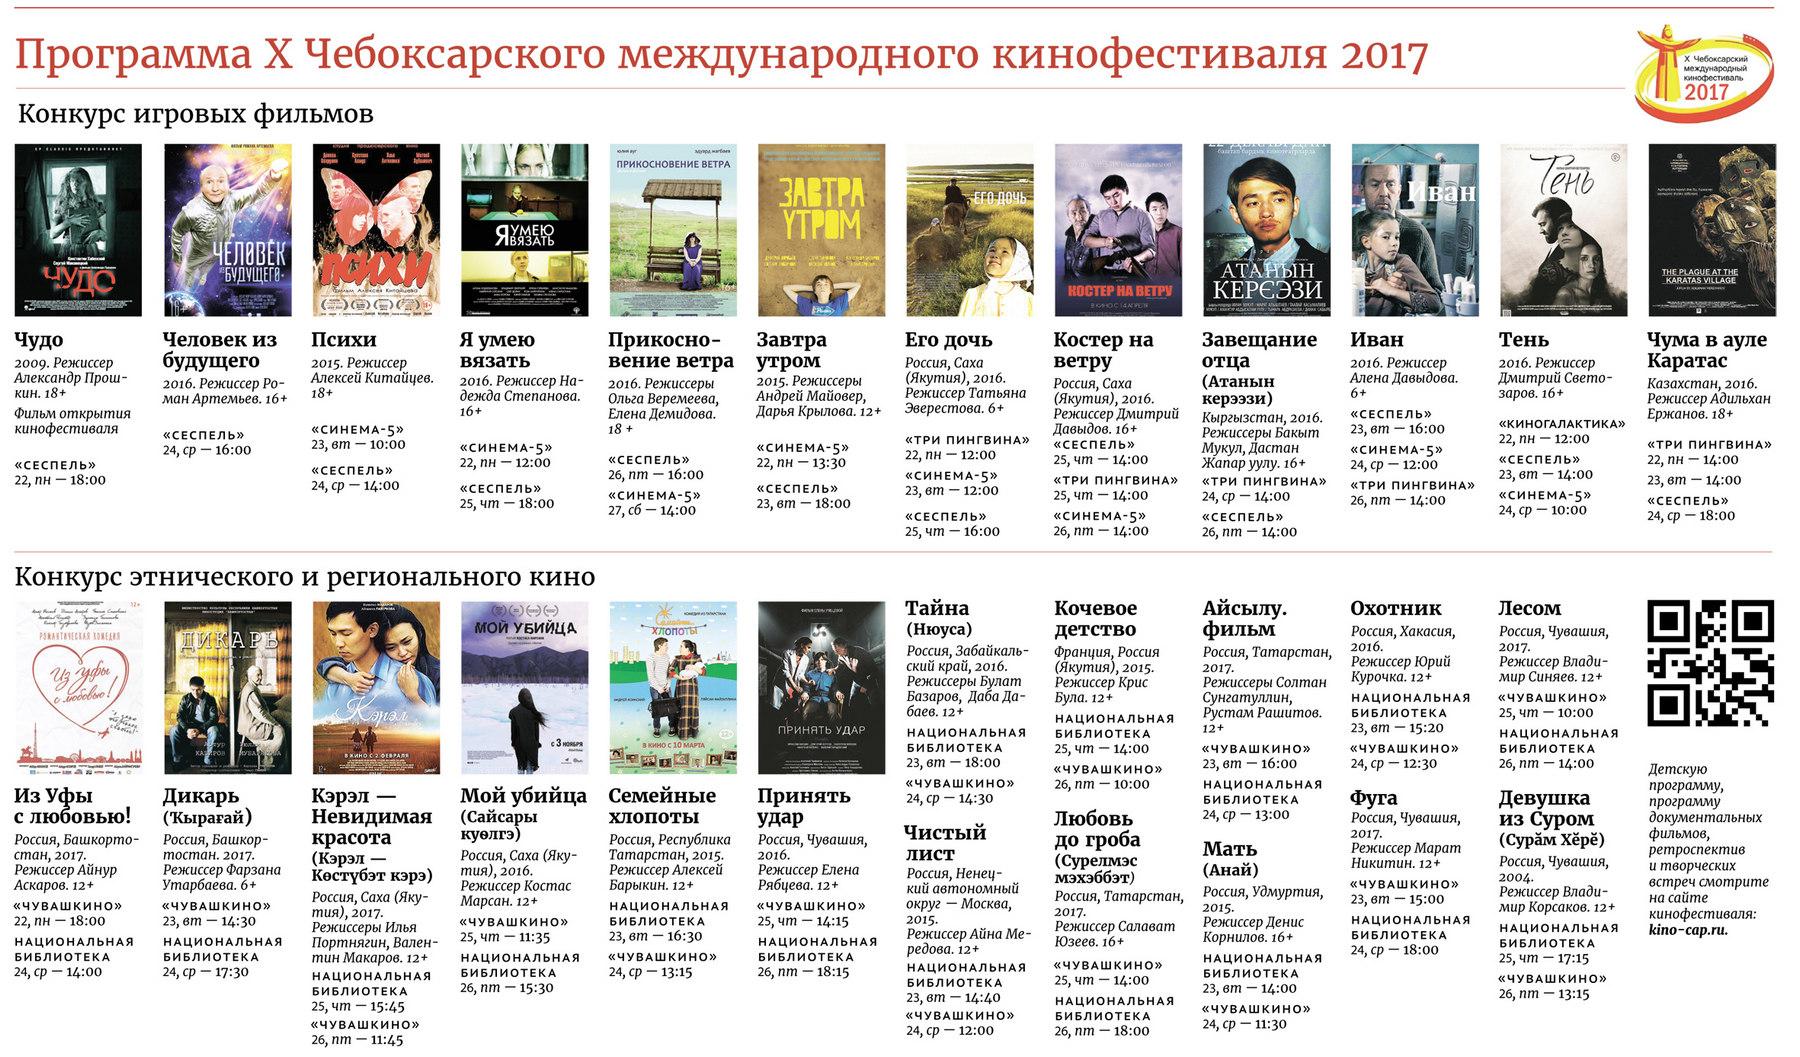 программа чебоксарского кинофестиваля 2017